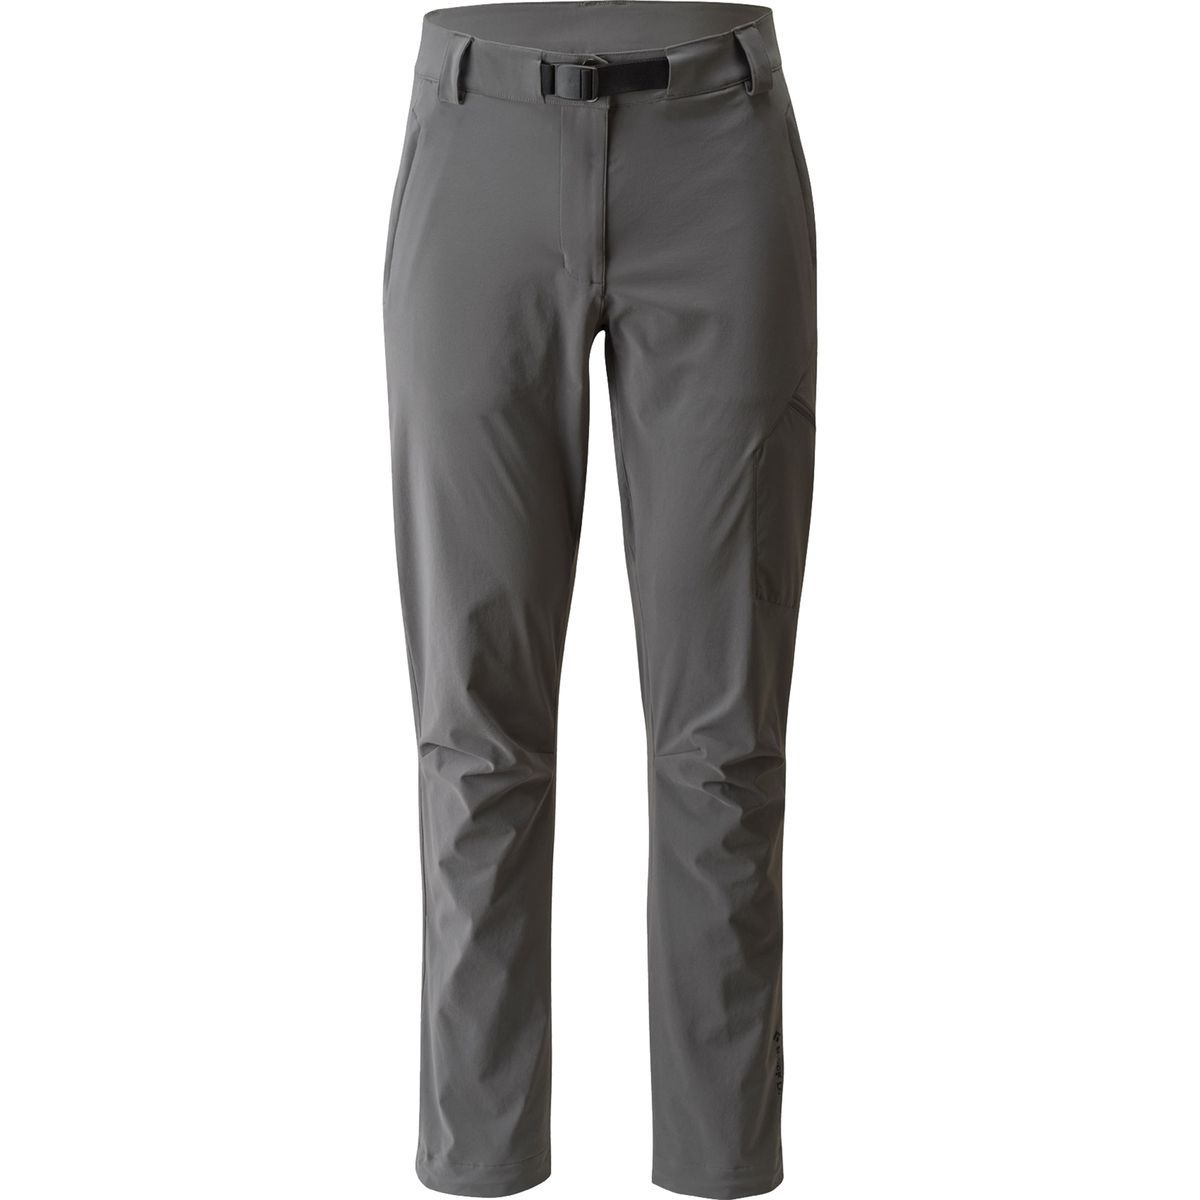 Black Diamond Alpine Pant - Men's